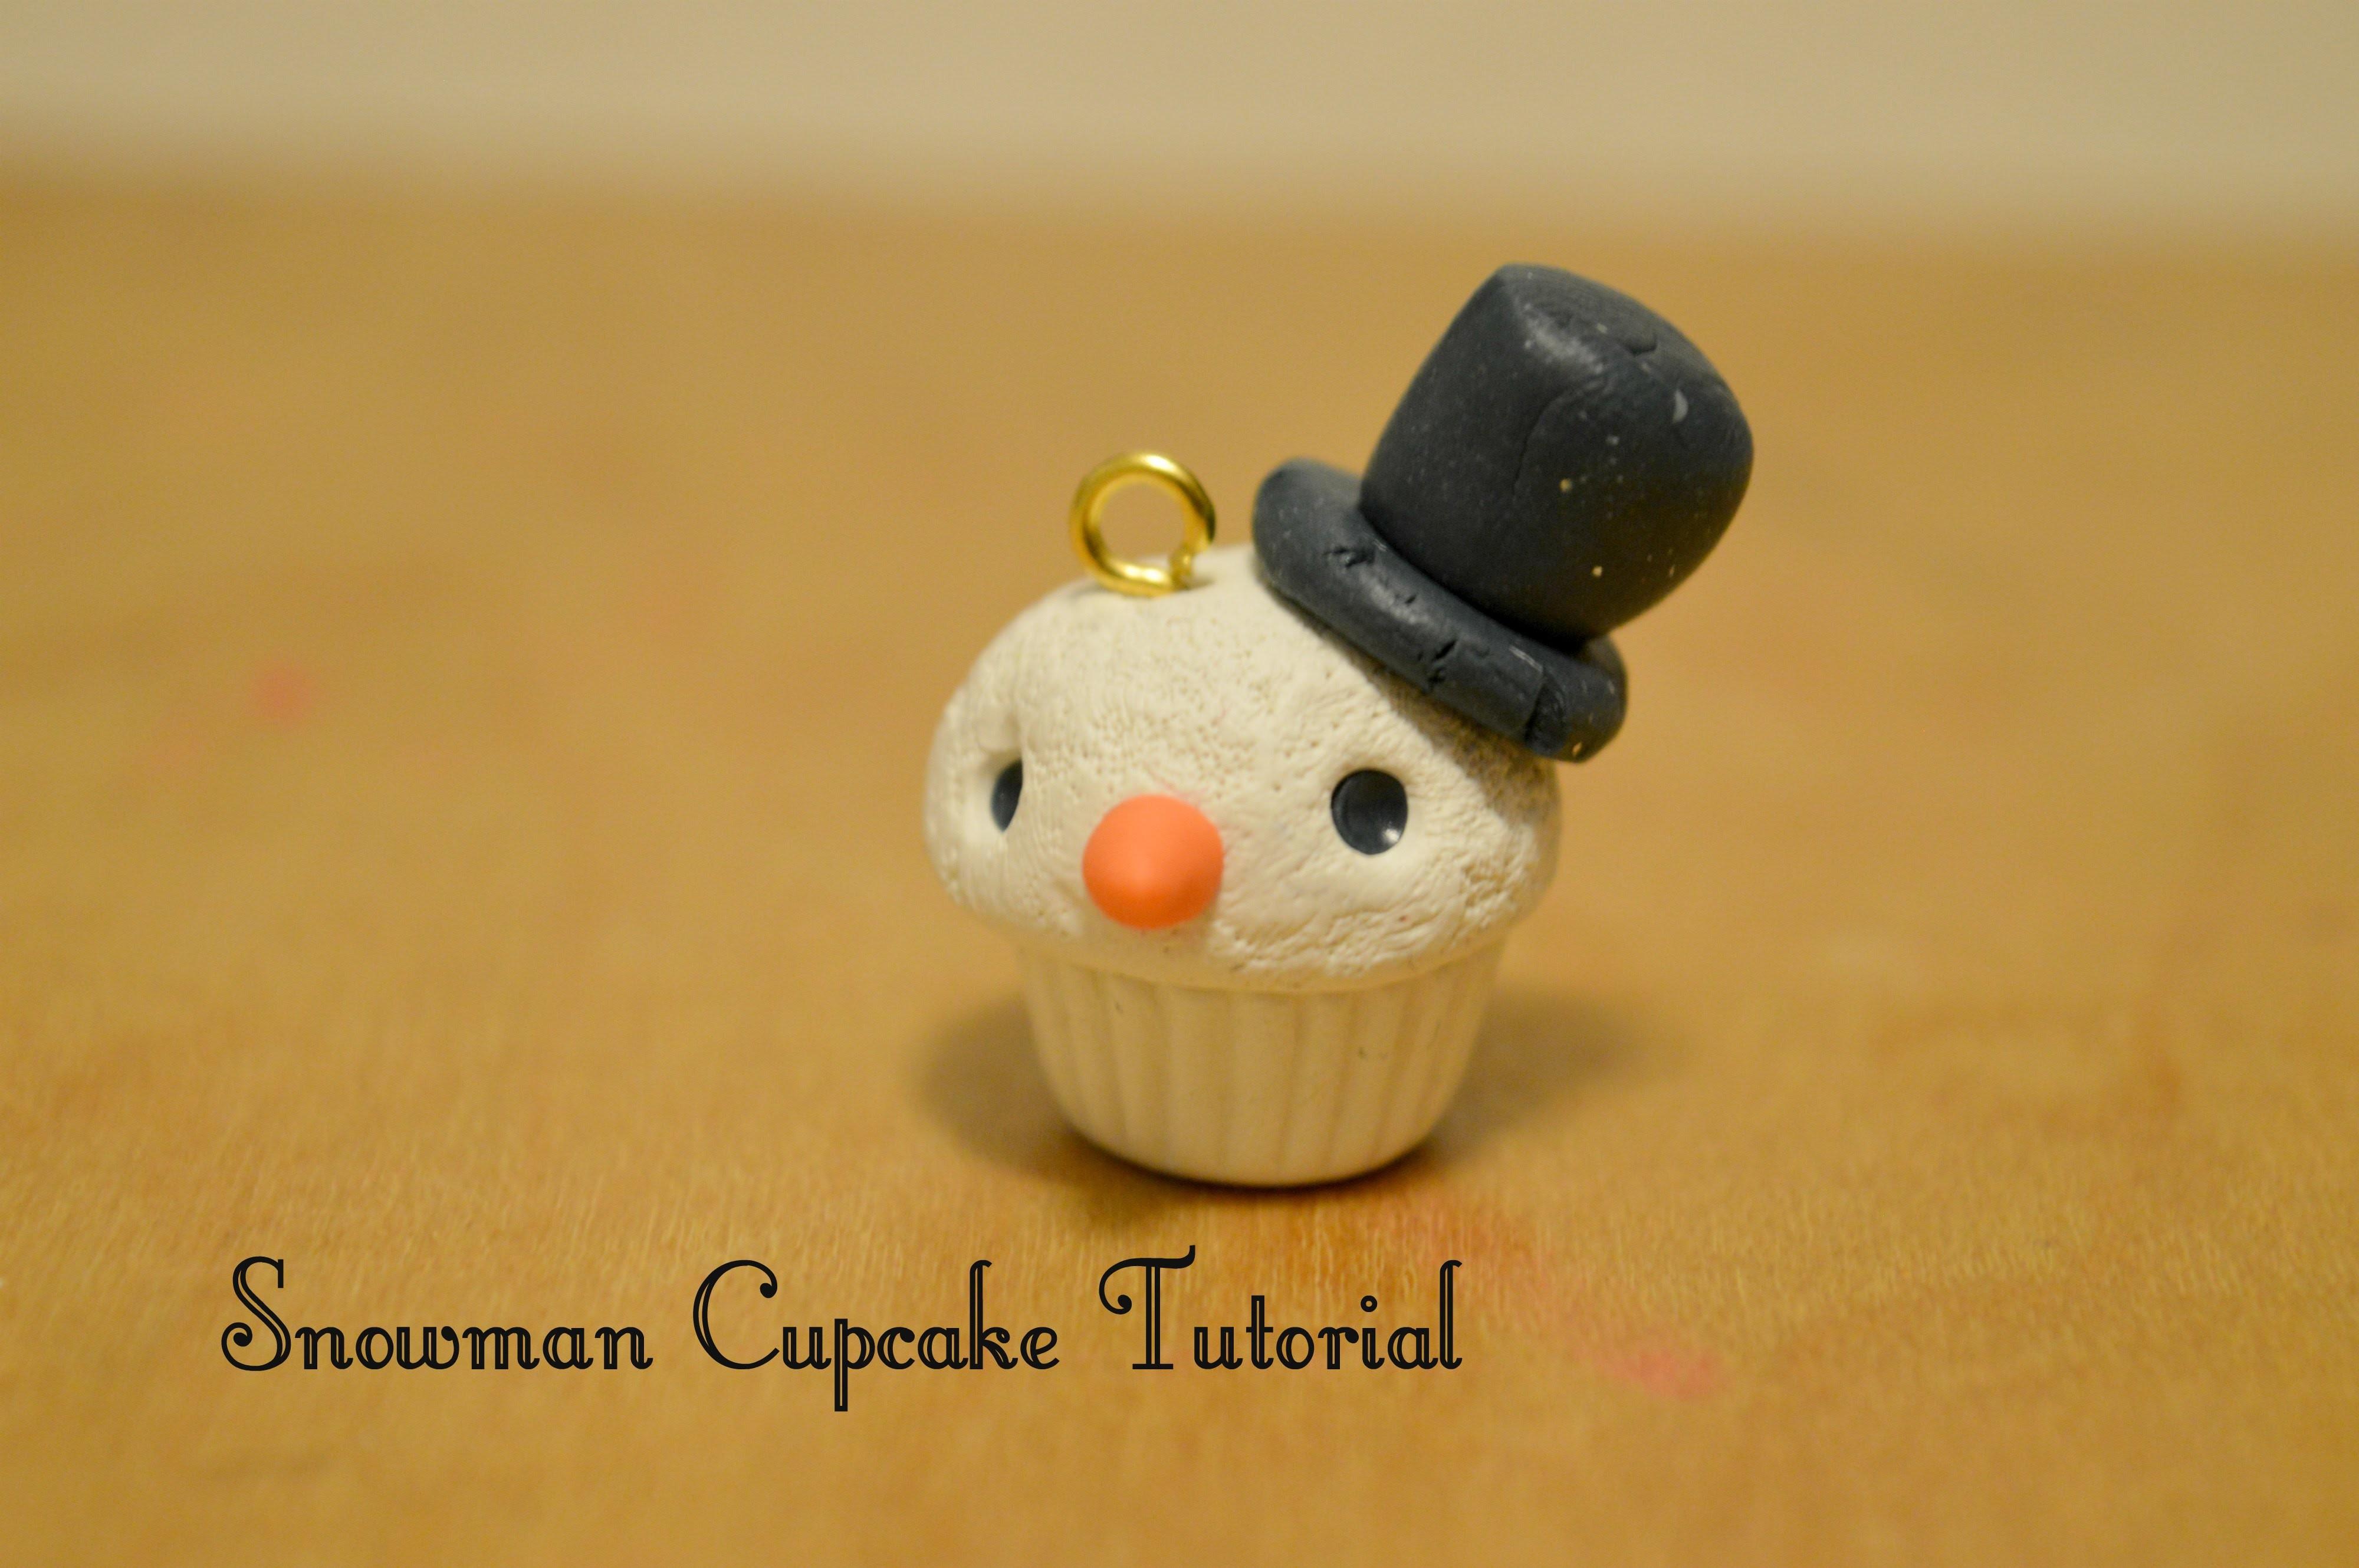 Polymer Clay - Snowman Cupcake Tutorial Collab w. AmazinCrafts!!! ♥